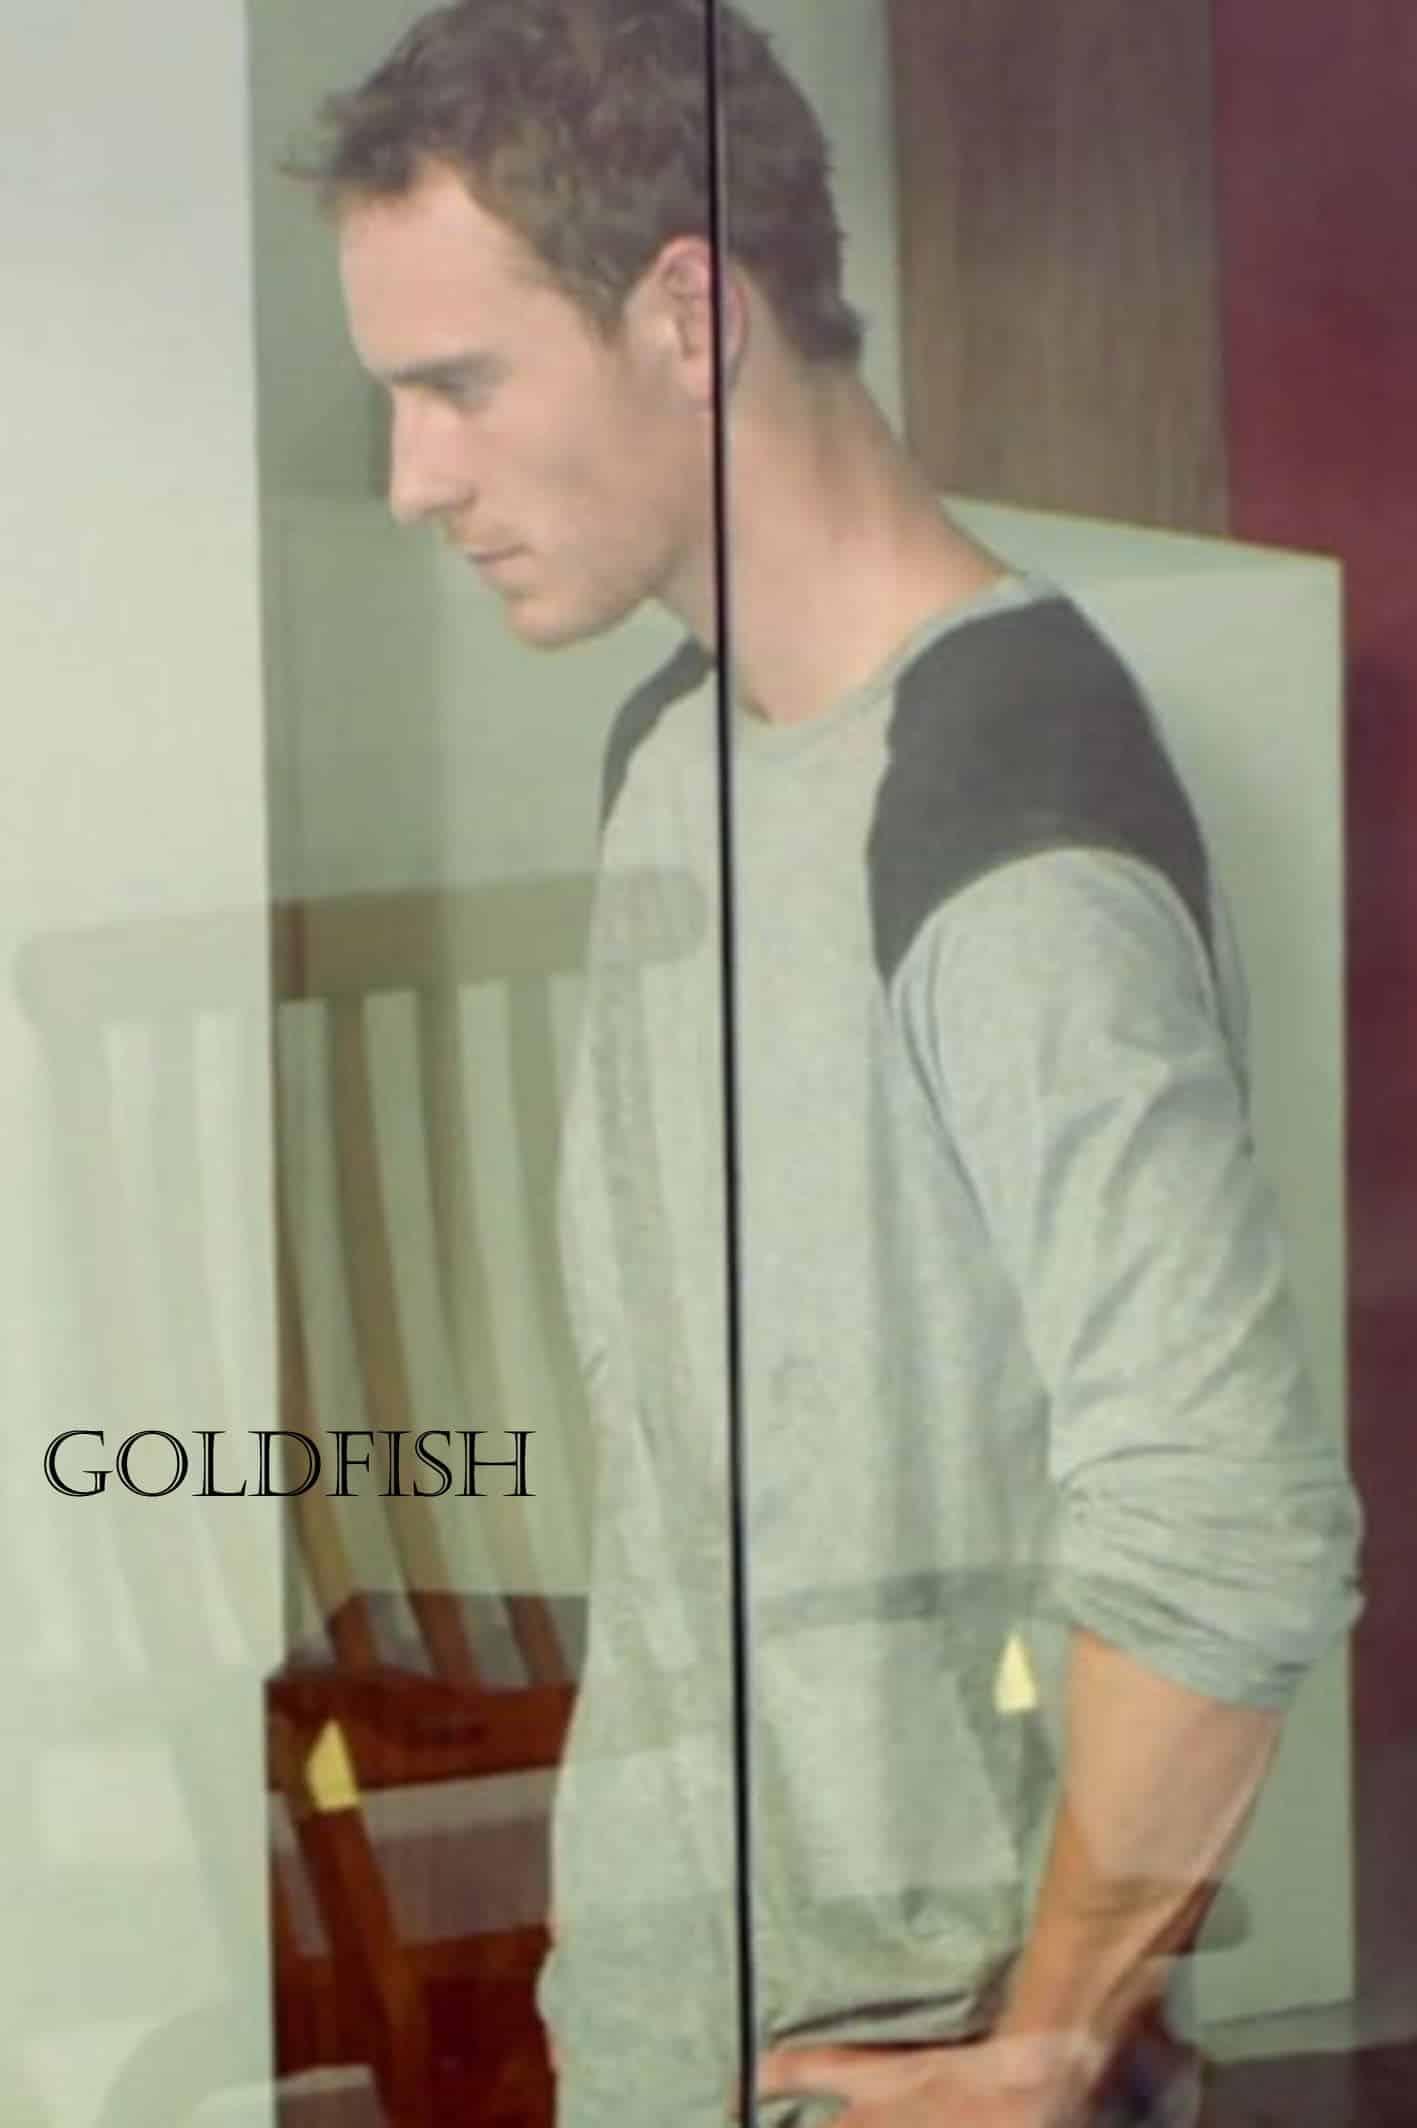 Goldfish, 2007